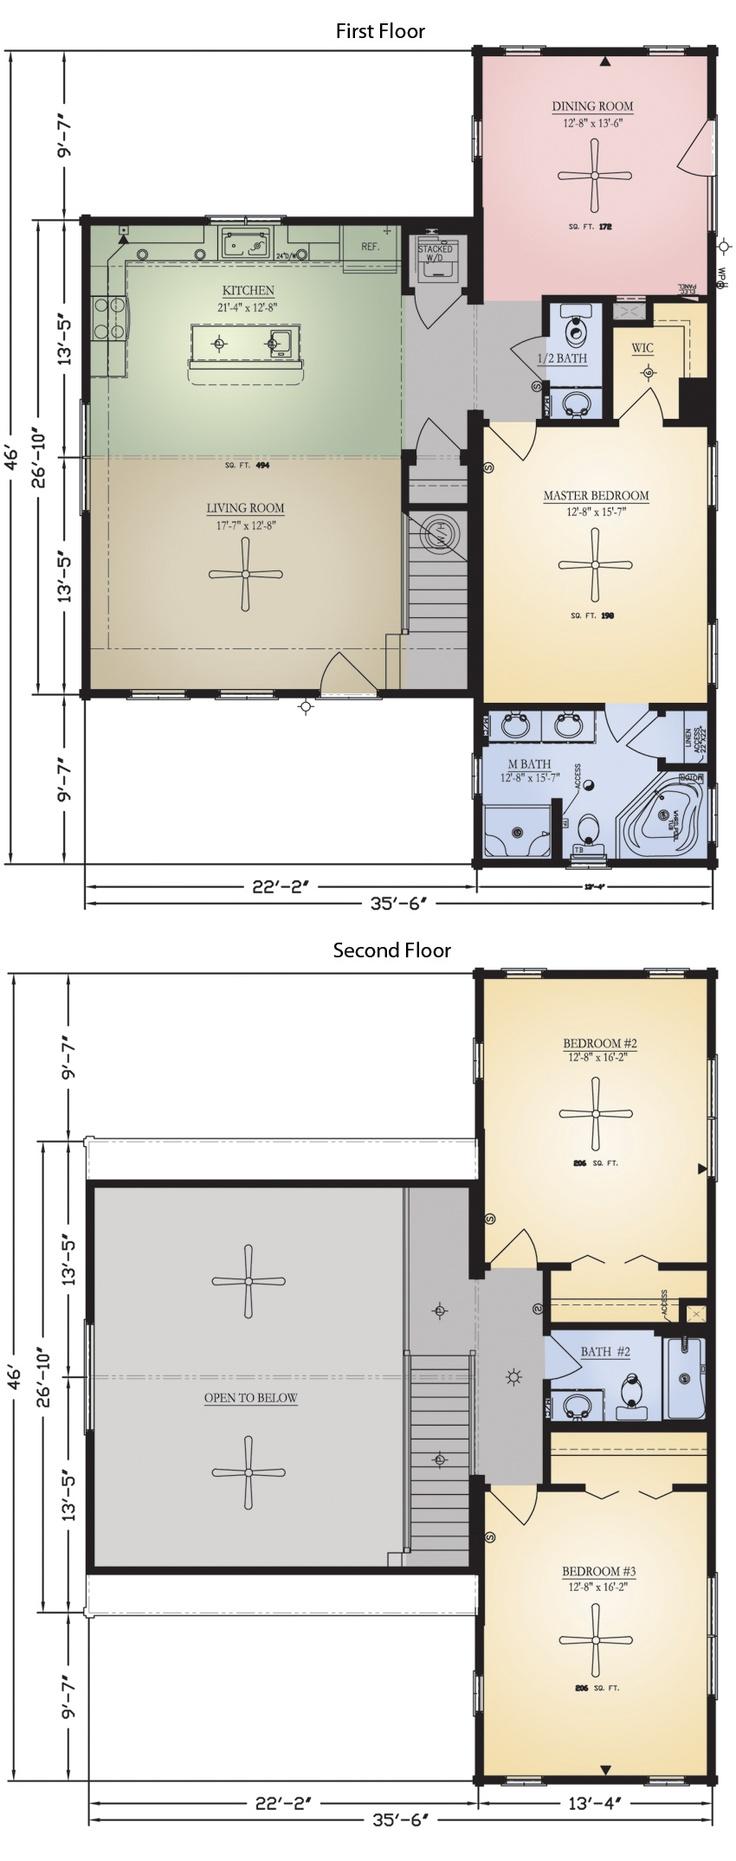 180 best home blueprints images on pinterest architecture box cabins loghomes brlc savannah ii log home floor plan blueprint click image